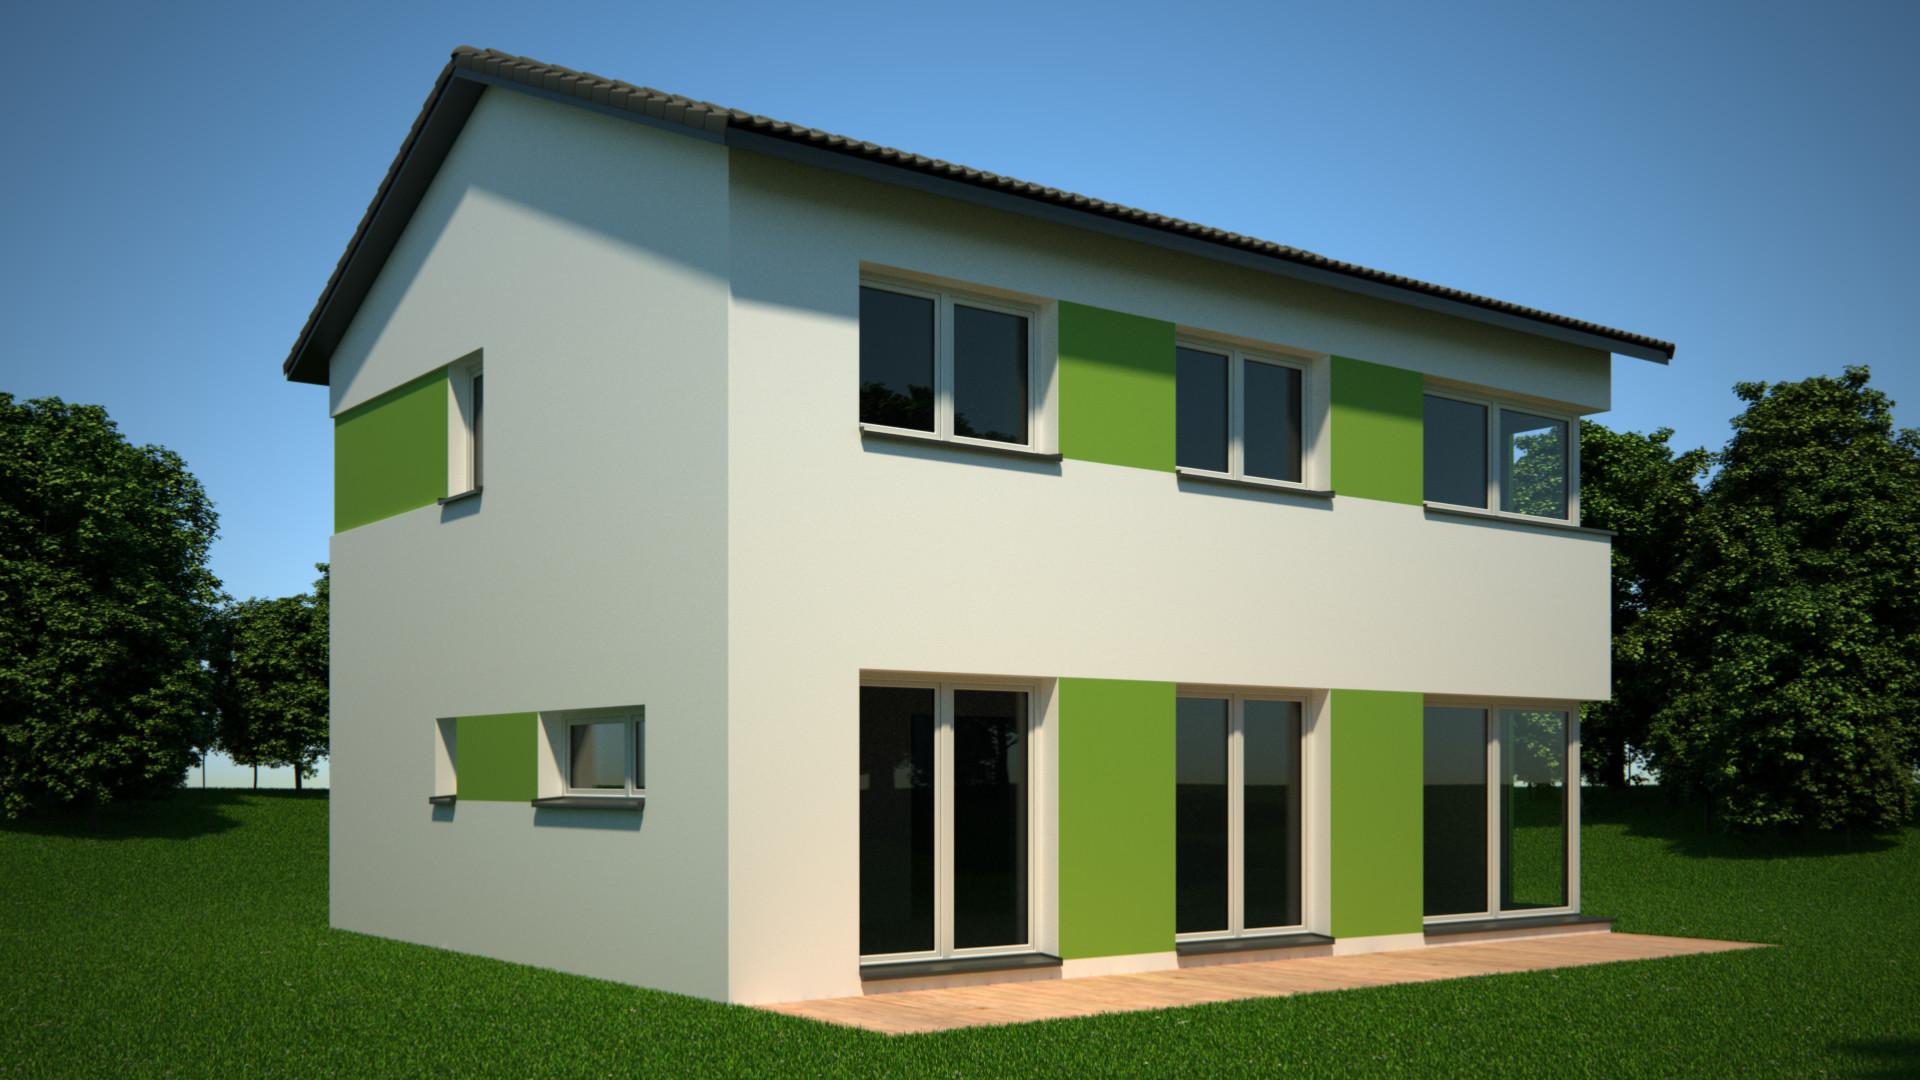 Reinhard kepplinger 130a cam3 terrasse dach iso 500 ohne vign refl trees stucco 94 newgrass